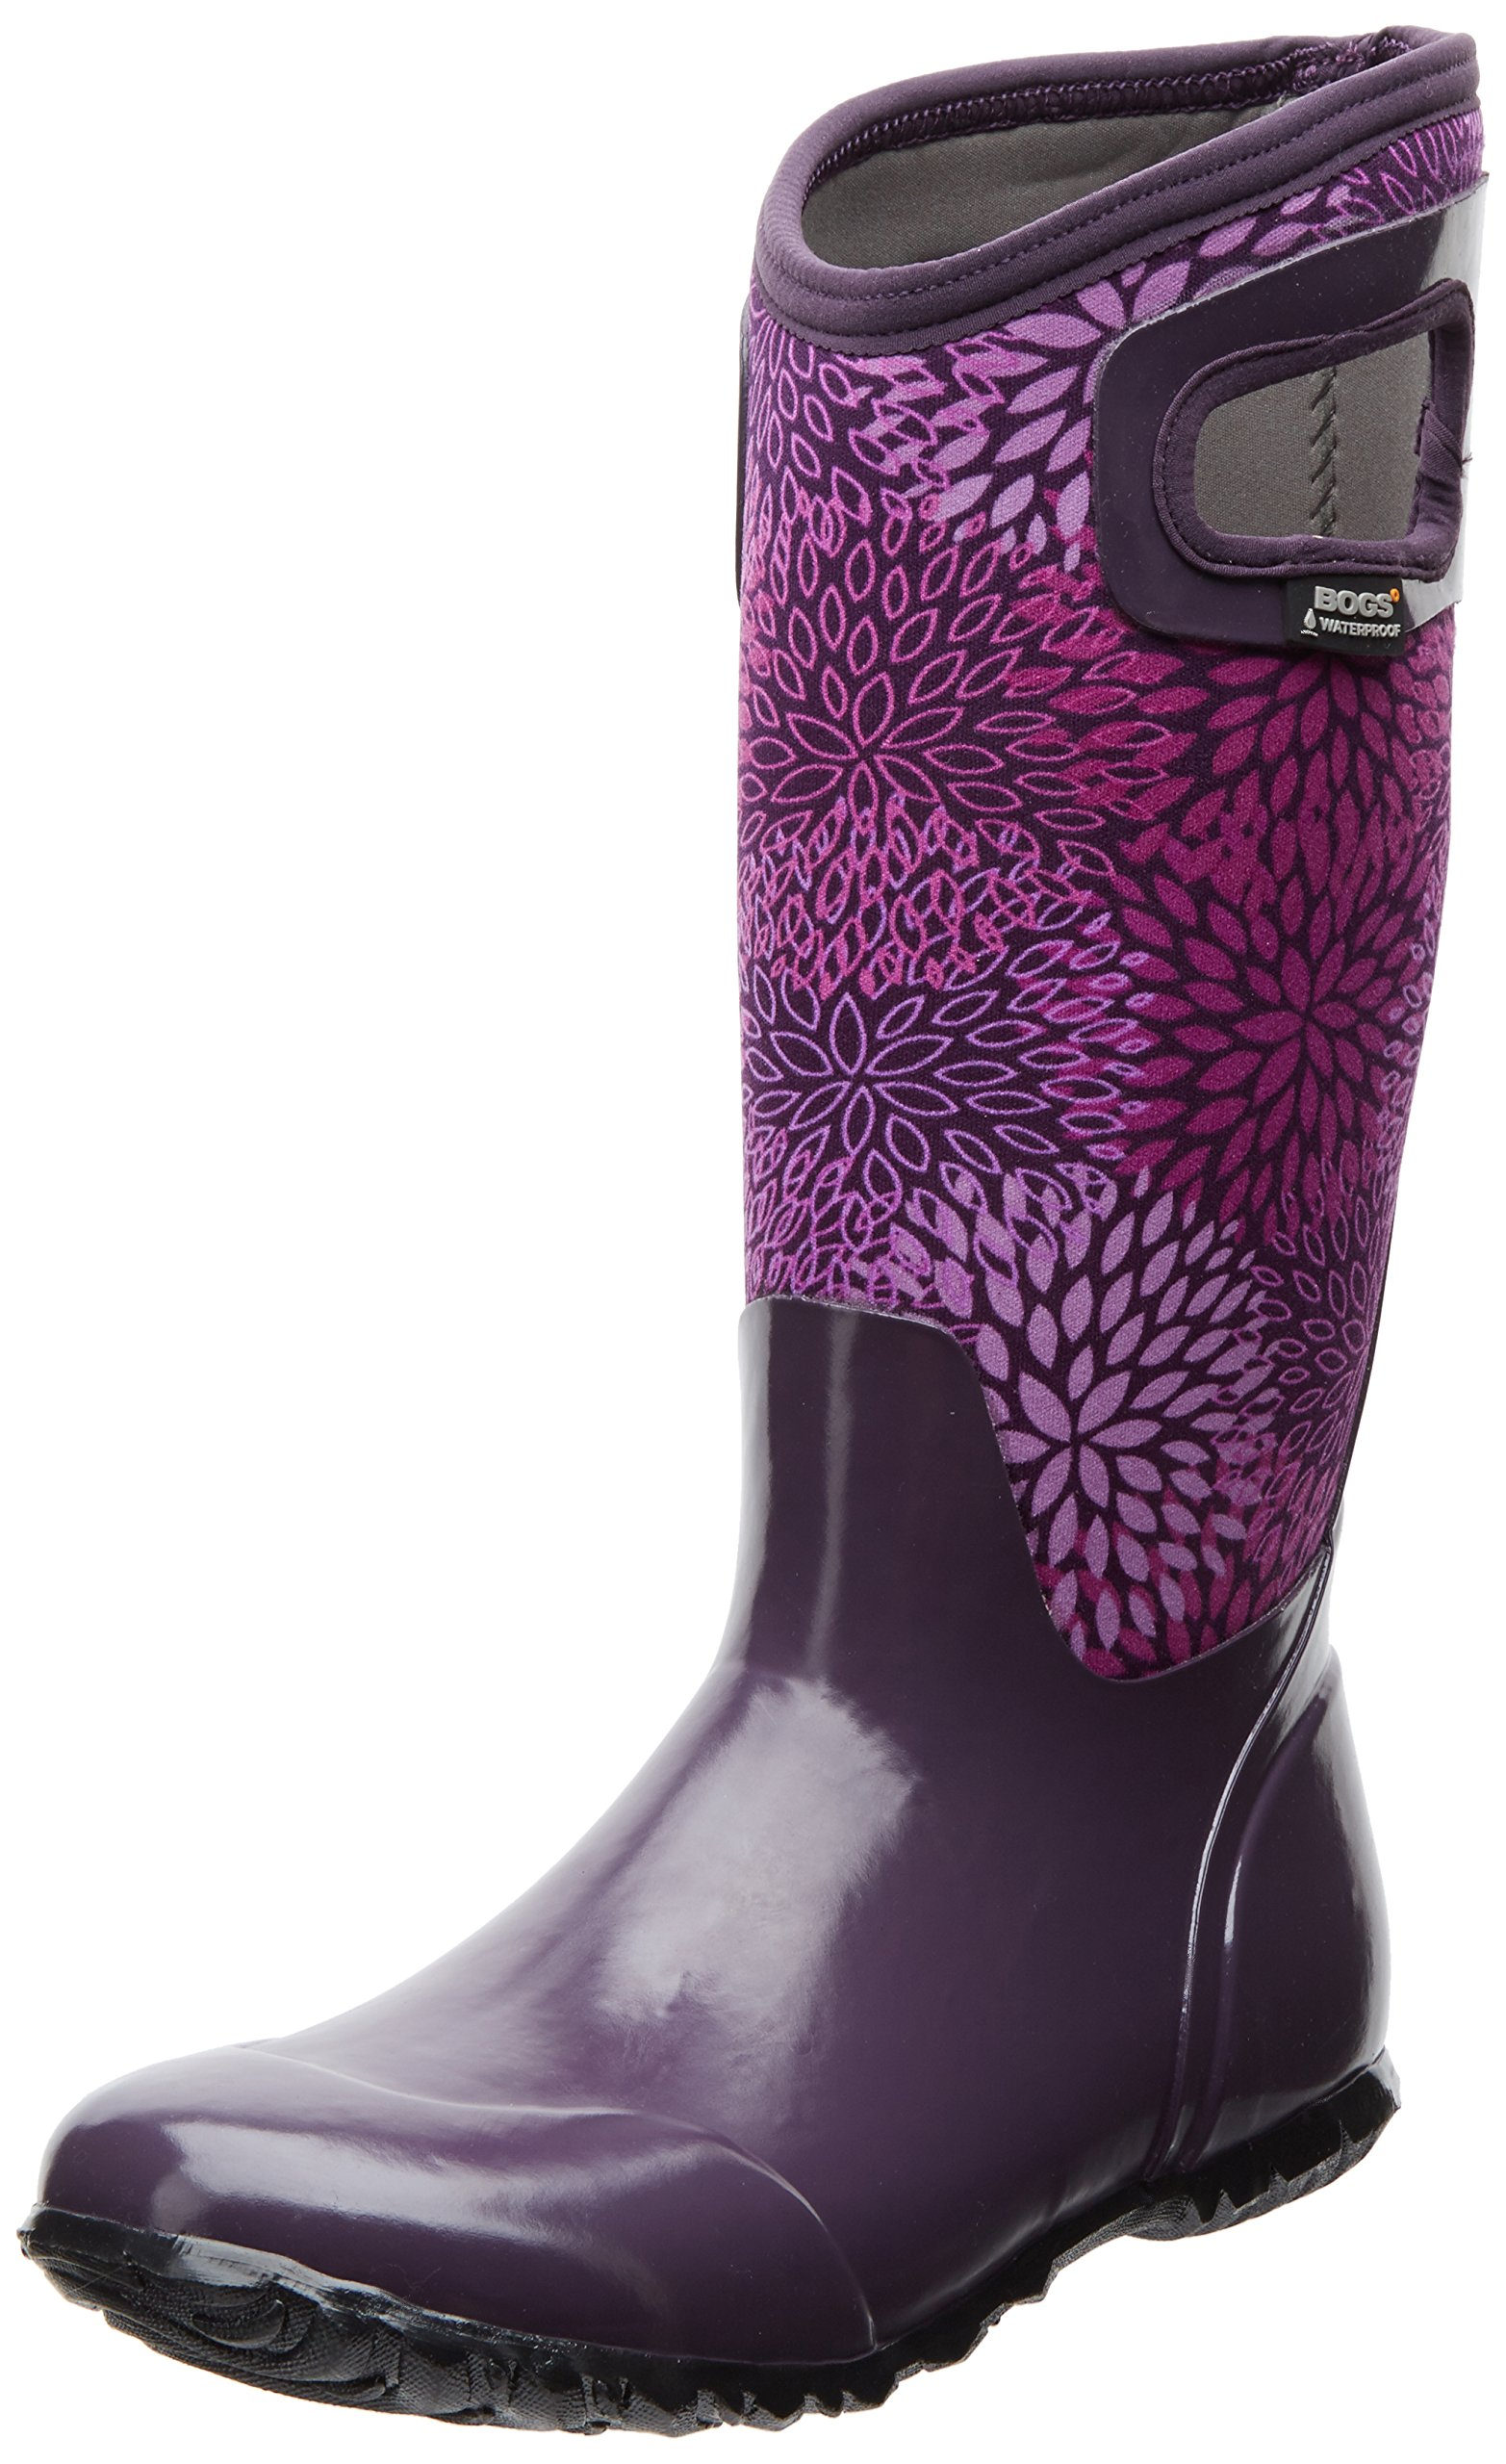 Bogs Women's North Hampton Floral Rain Boot,Plum,7 M US